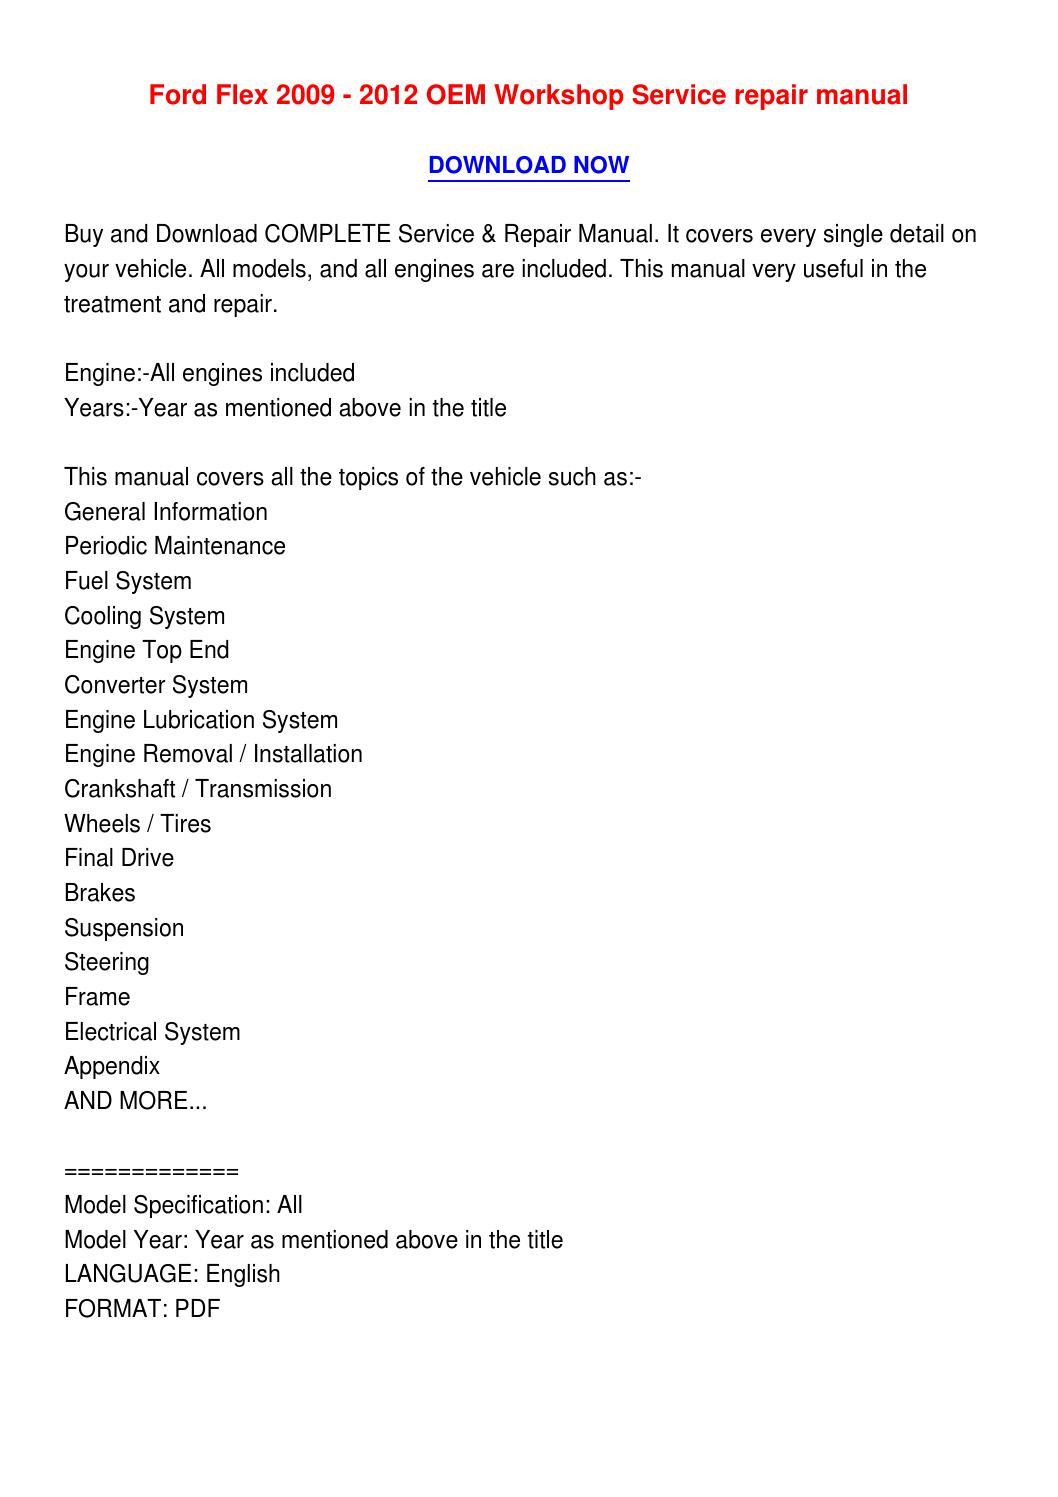 2009 ford flex service manual pdf